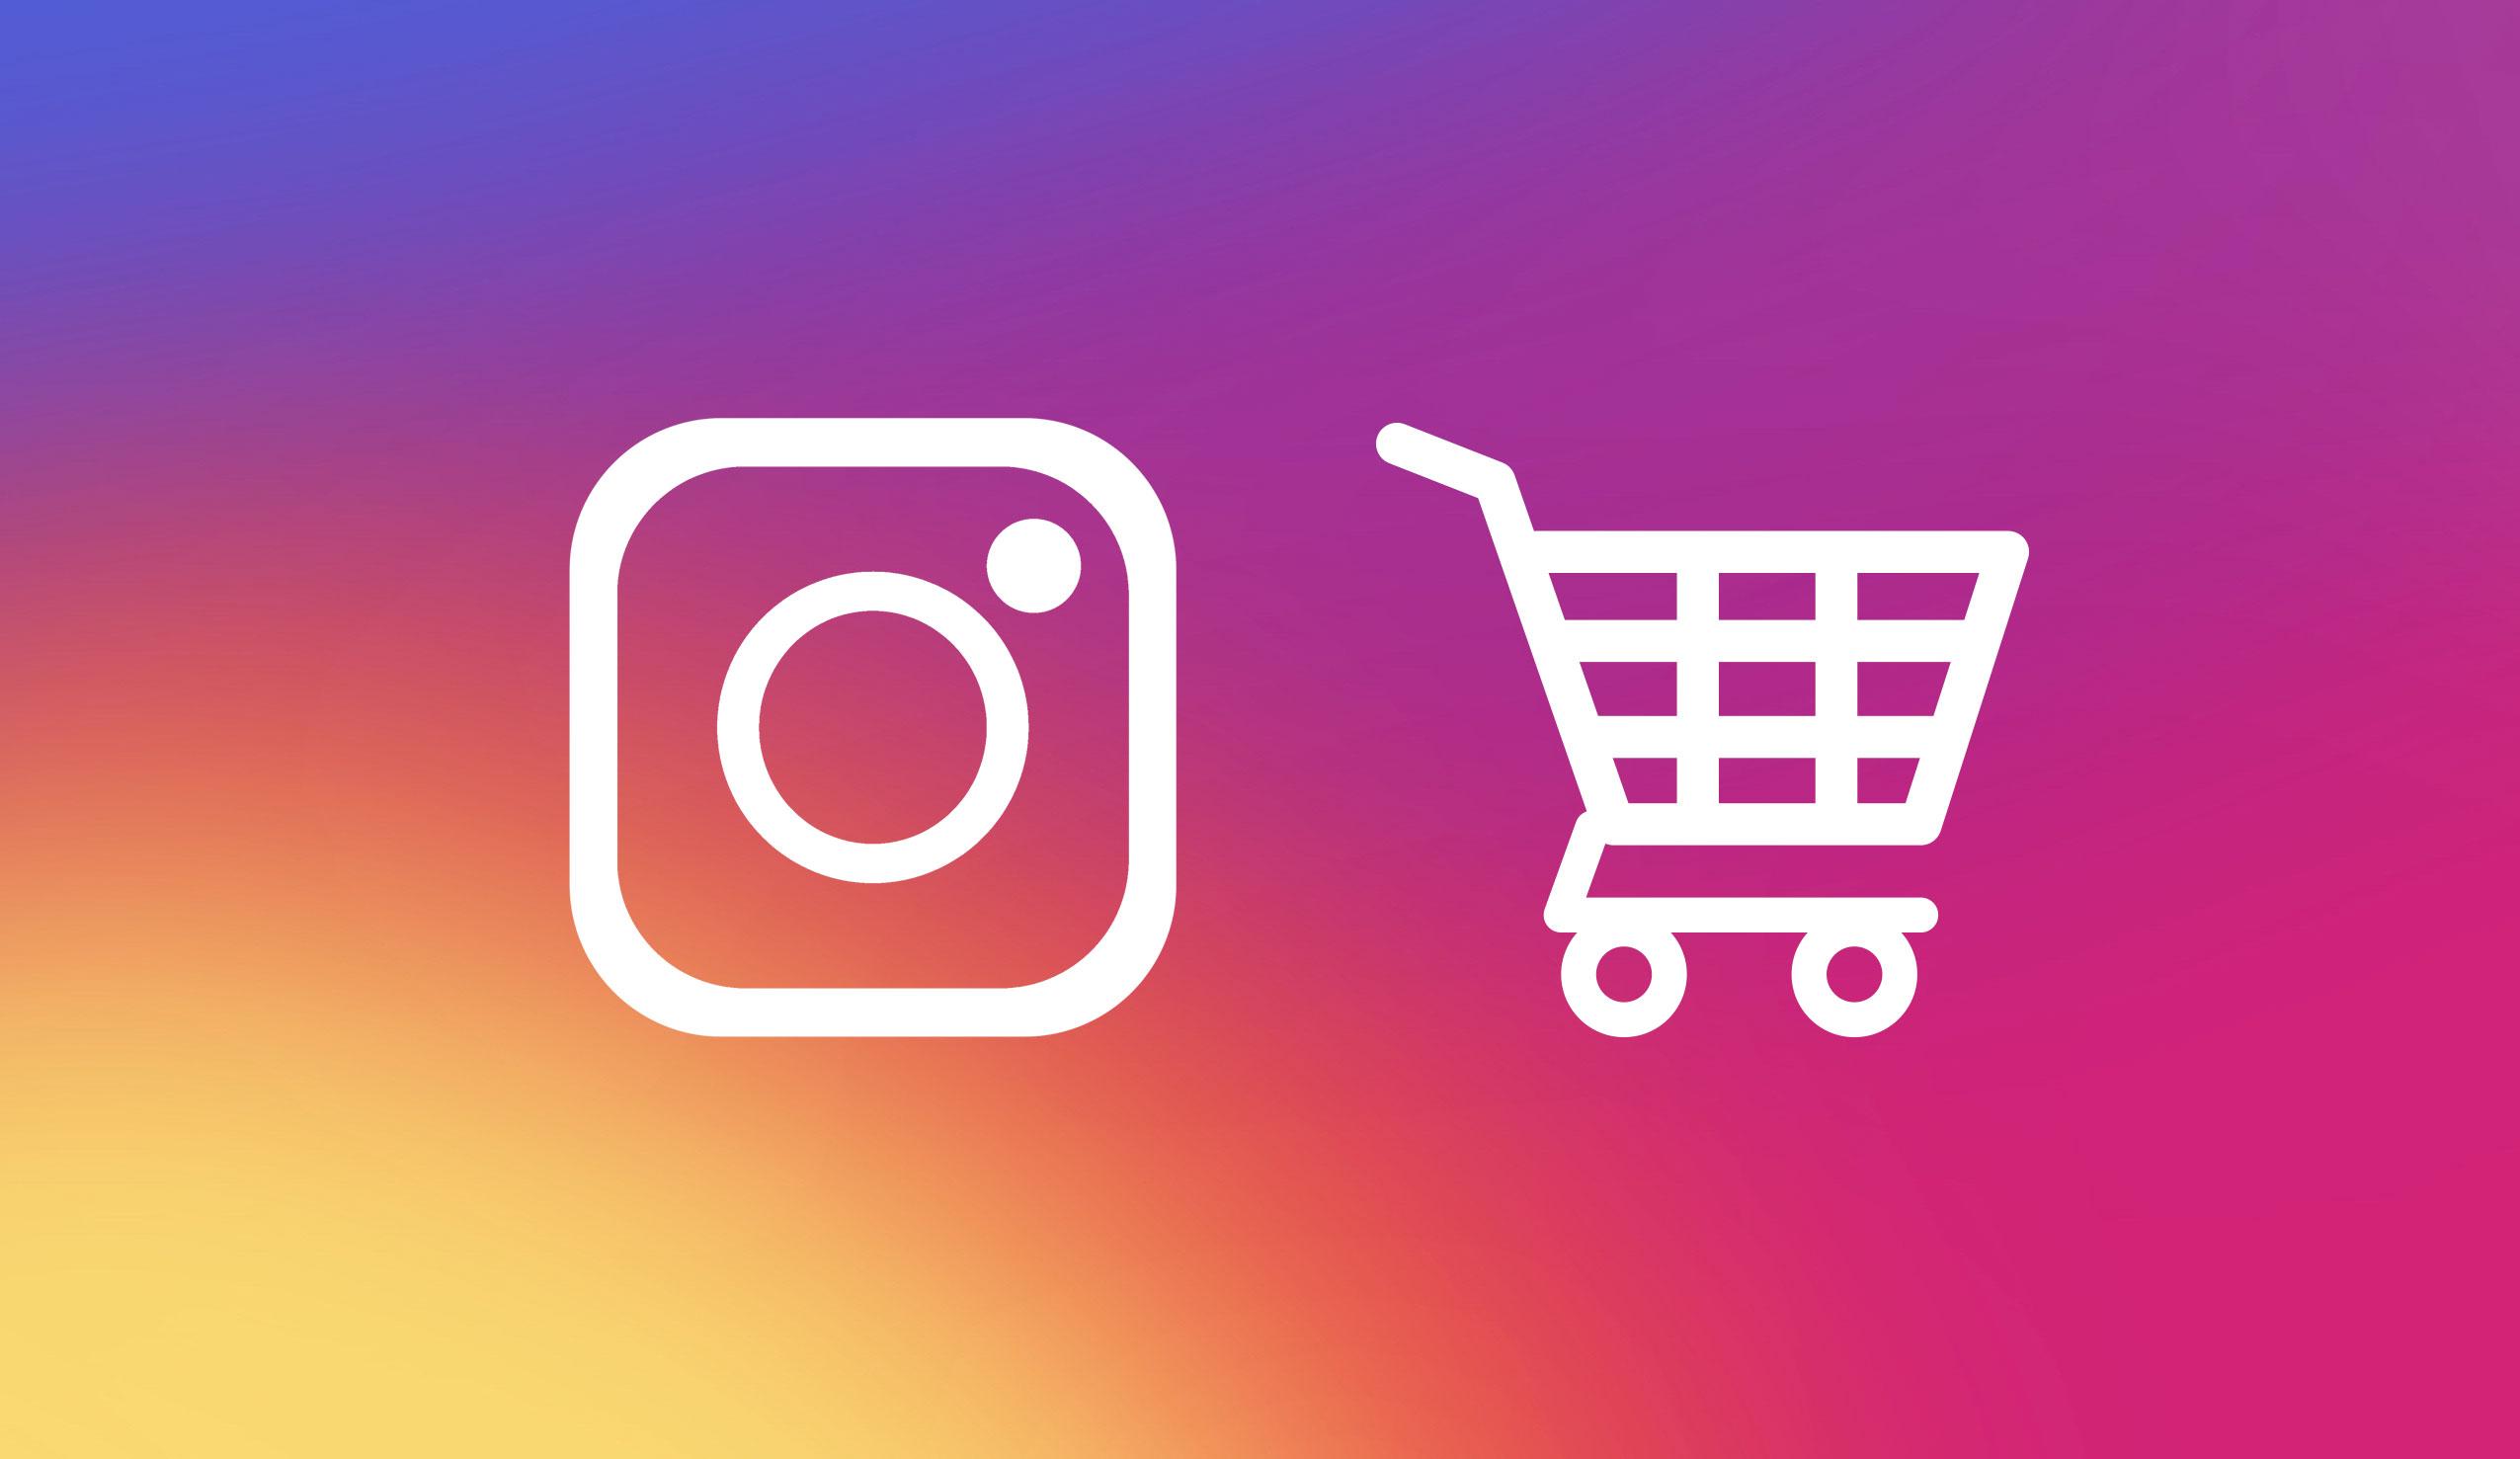 Instagram sta costruendo un'app esclusivamente per lo shopping